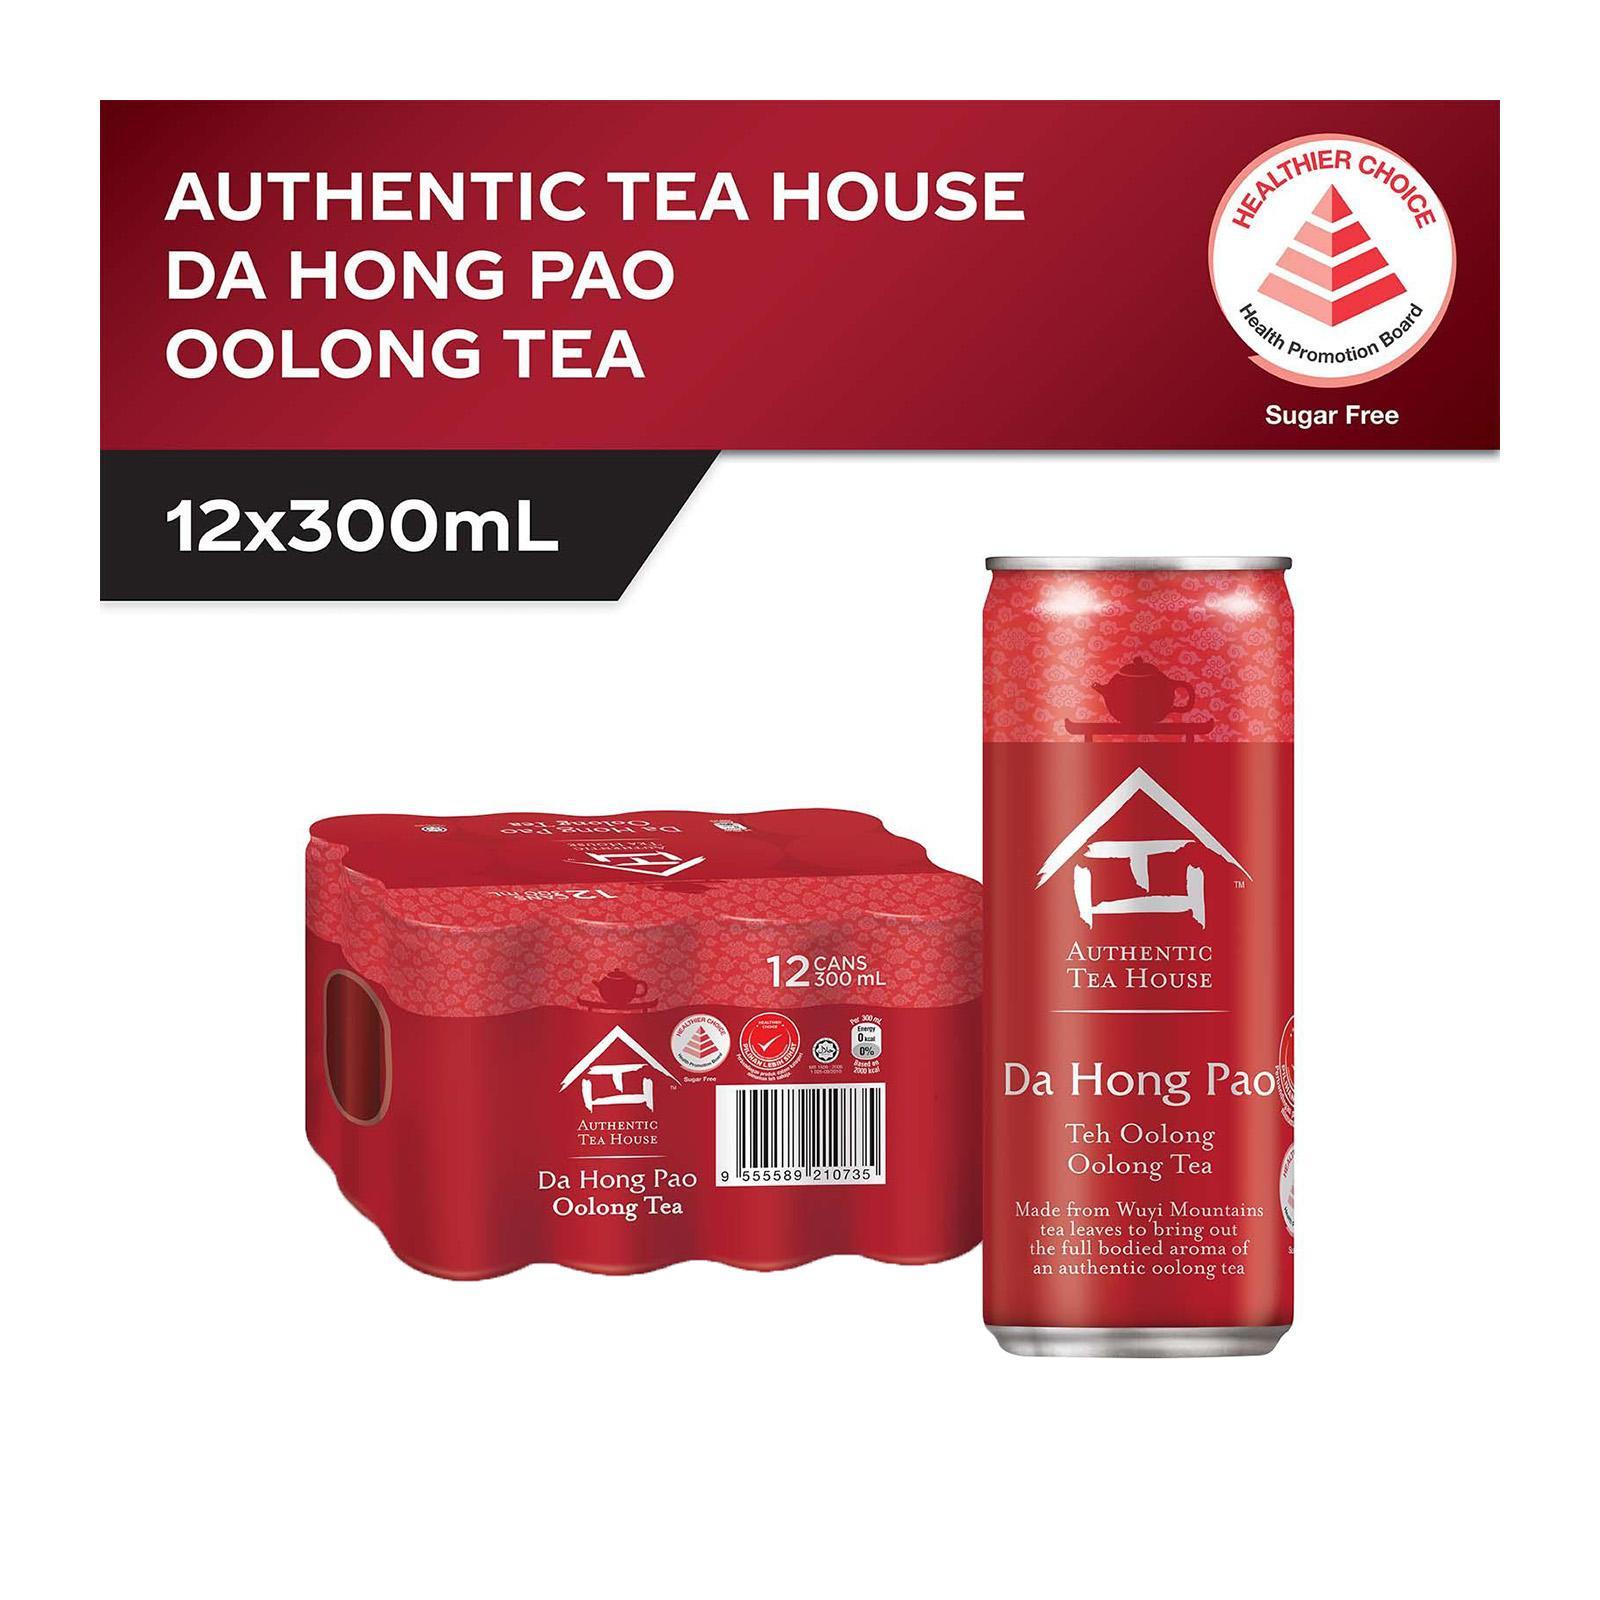 Authentic Tea House Da Hong Pao No Sugar Oolong Tea (12 x 300ml) - Case